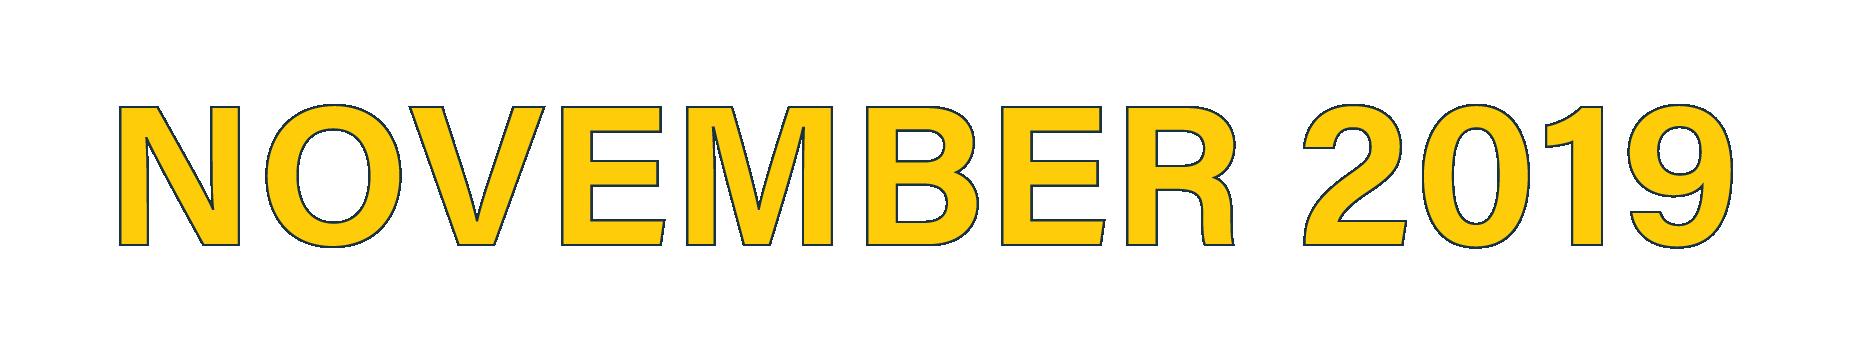 ADB nov 2019 -13.png